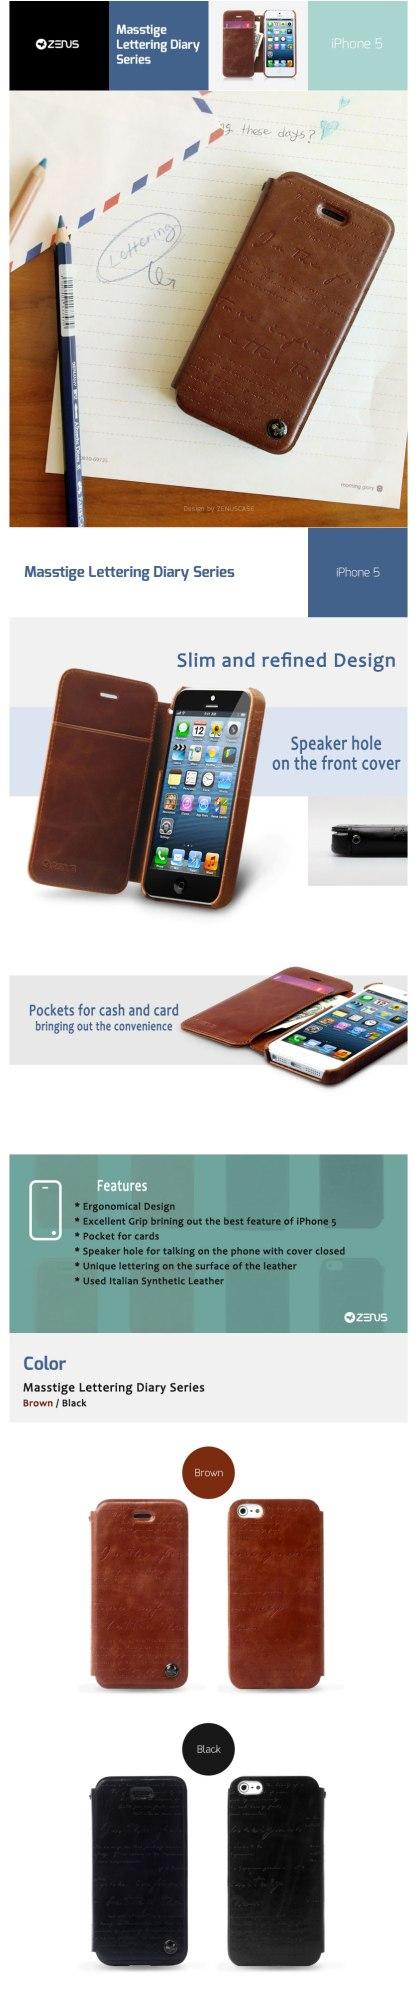 Zenus iPhone5 Masstige Lettering Diary Series